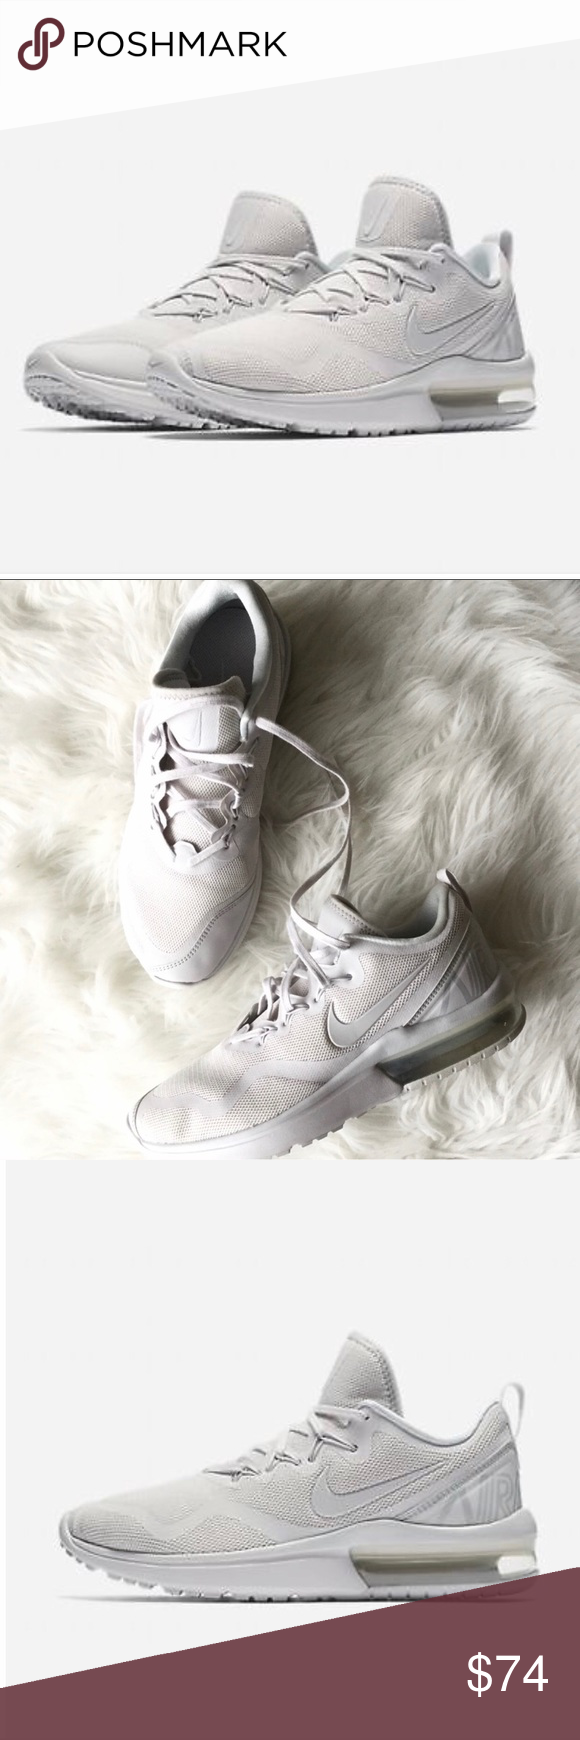 Nike Air Max Fury White Vast Grey Platinum AA5740-100 Women/'s Shoes